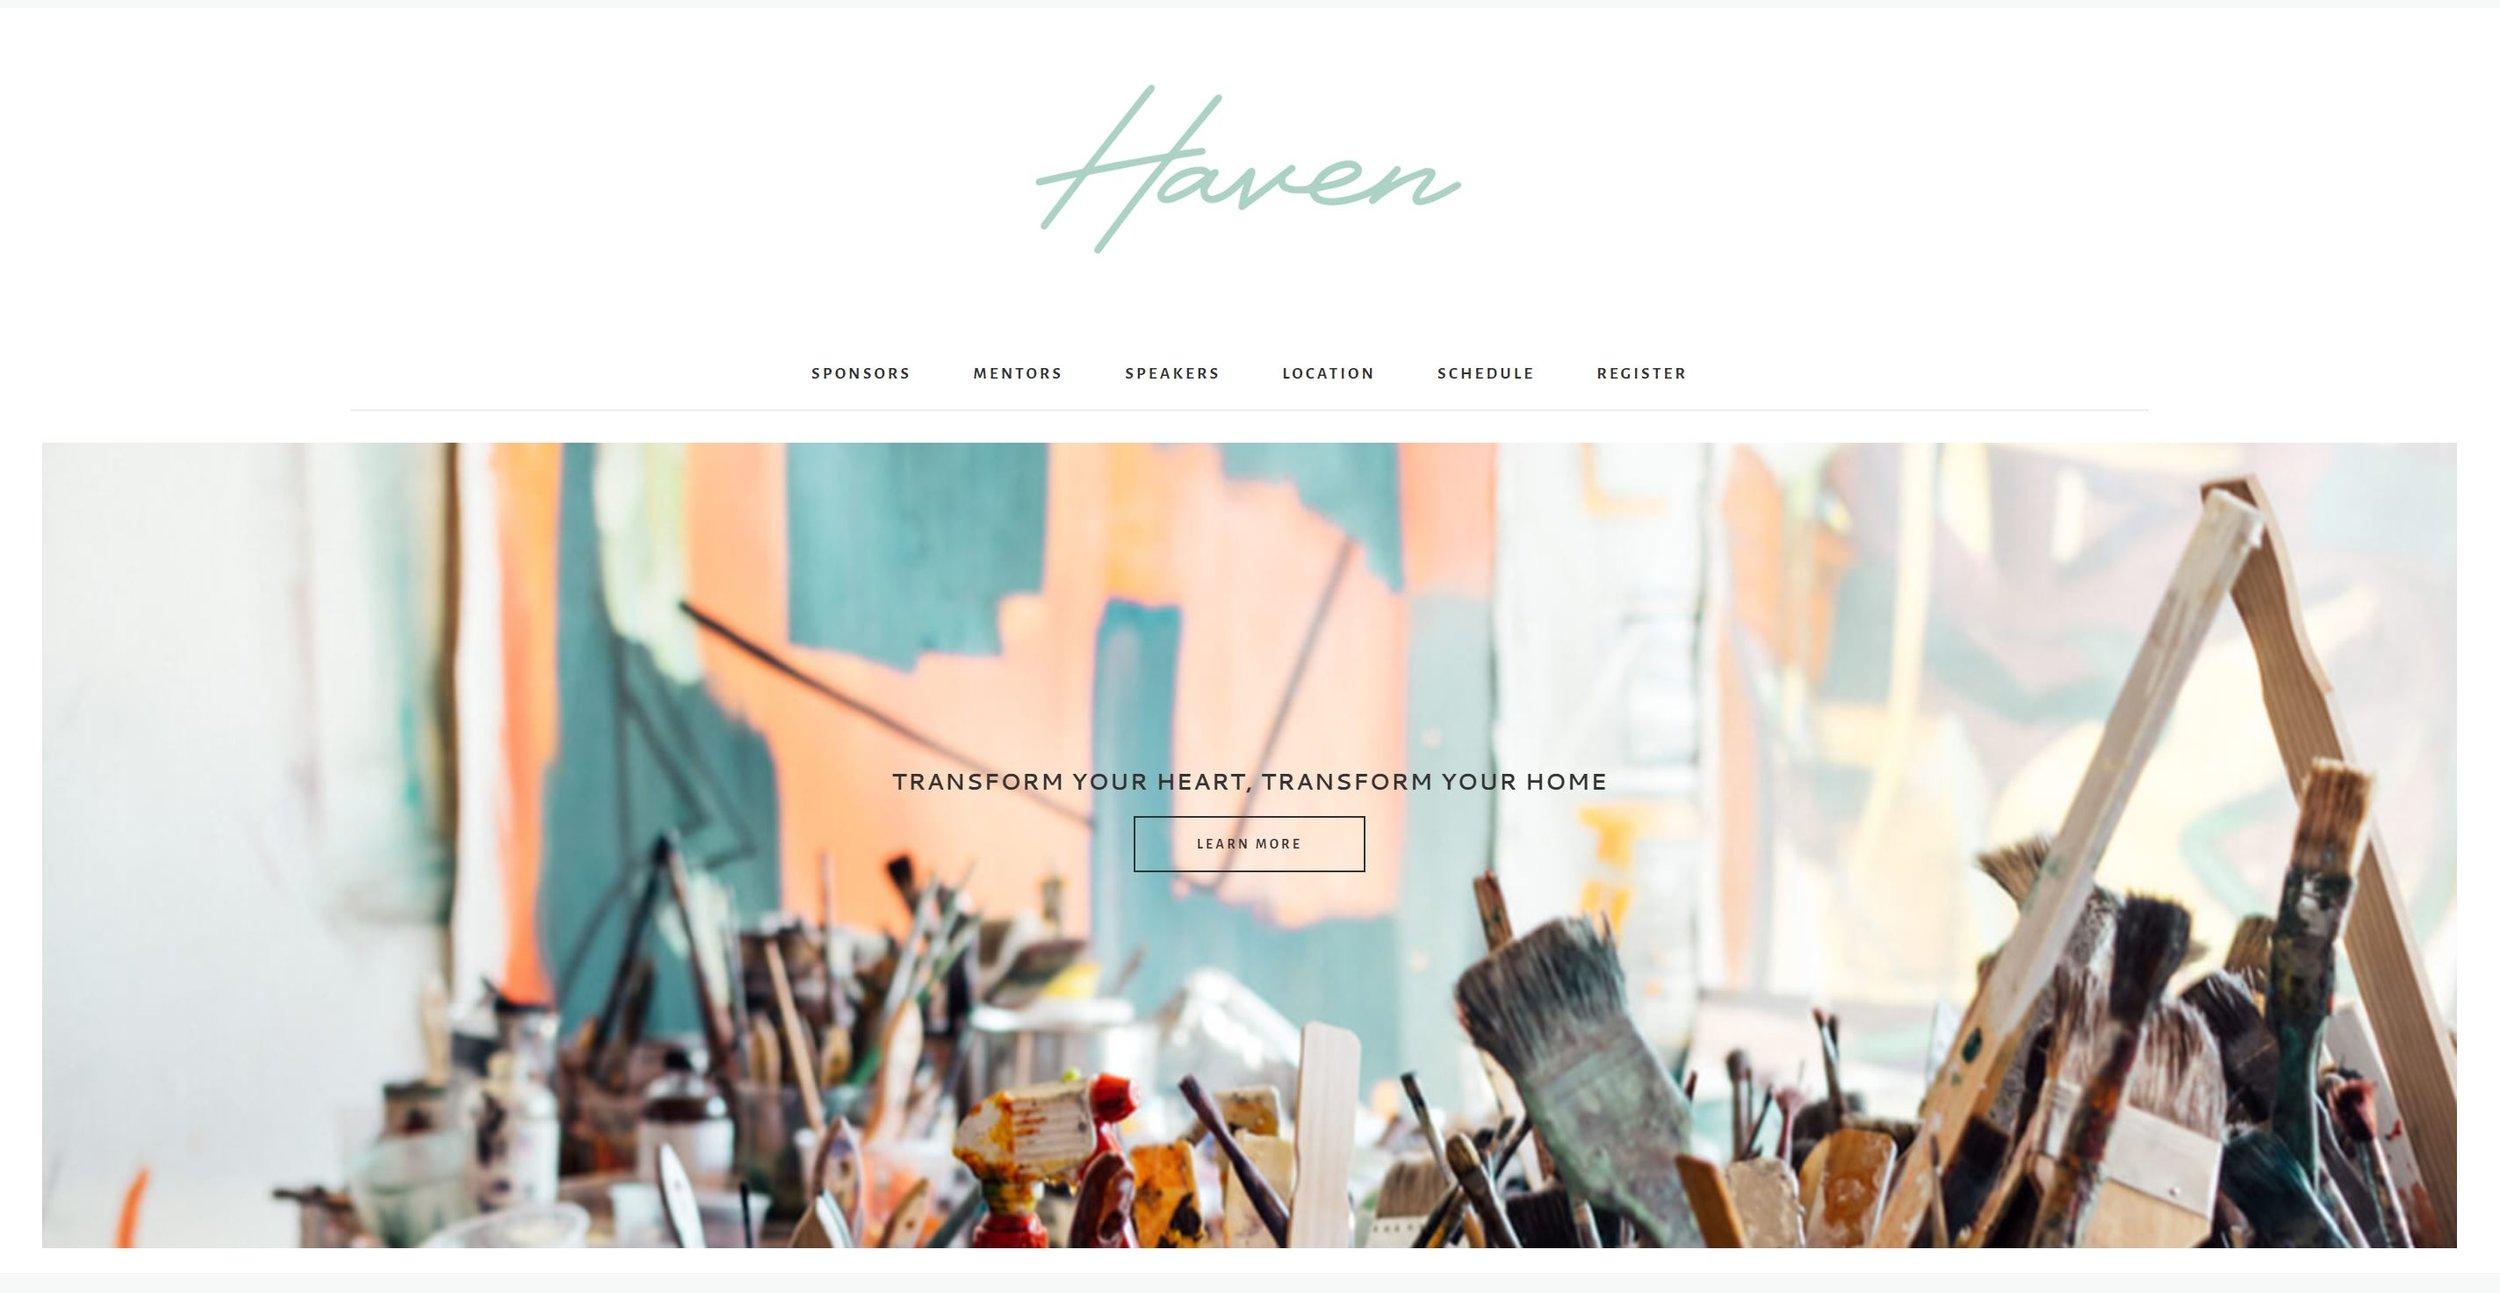 Haven Conference - EurDesign Studio Blog feature